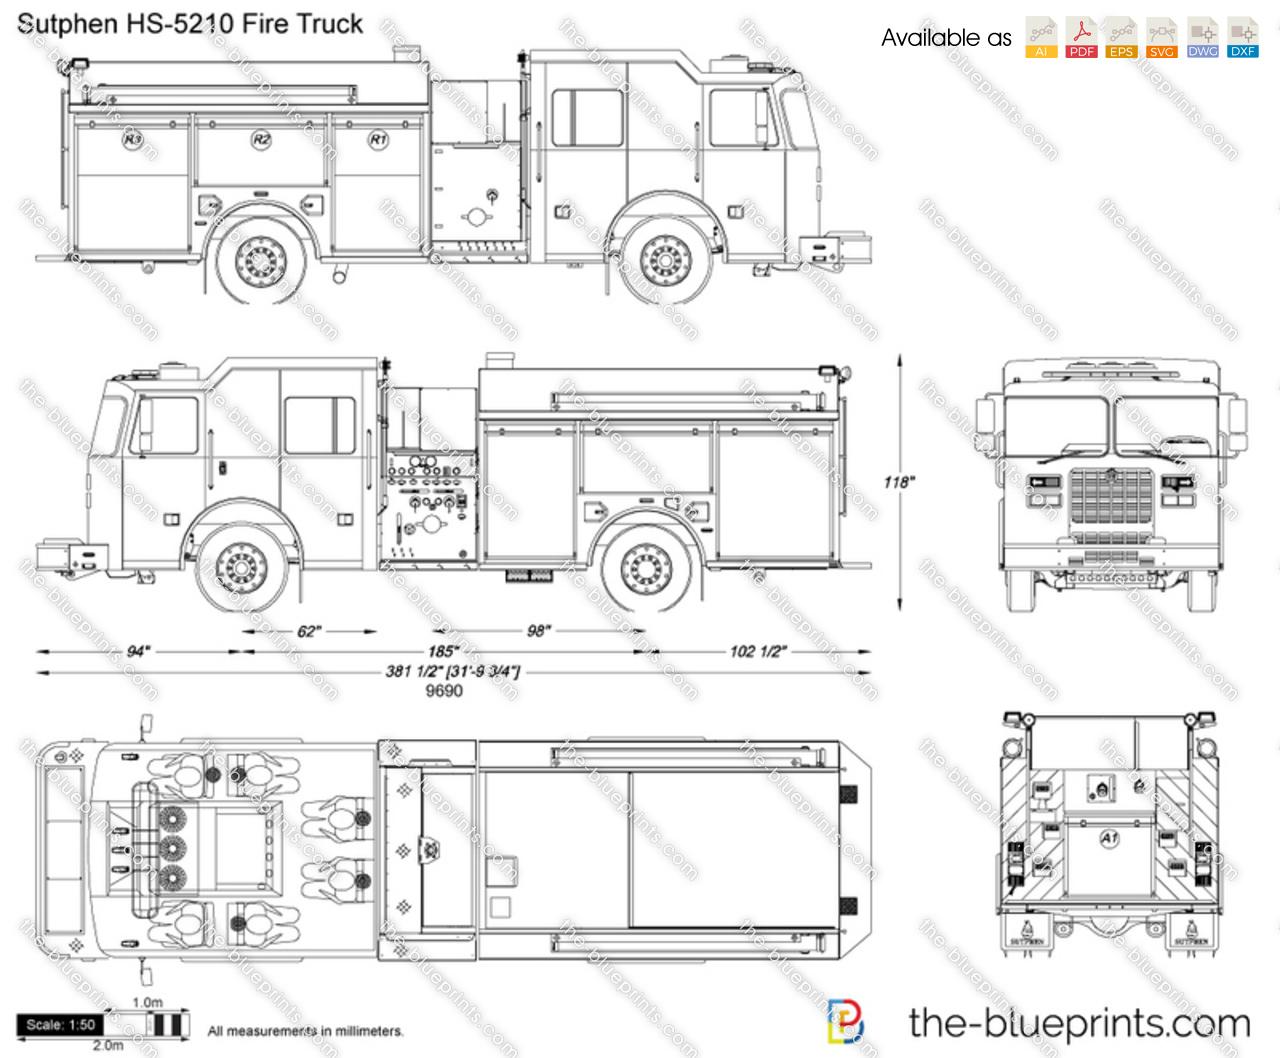 Fire Truck Van Schematic Wire Center Pierce Engine Pump Diagram Sutphen Hs 5210 Vector Drawing Rh The Blueprints Com